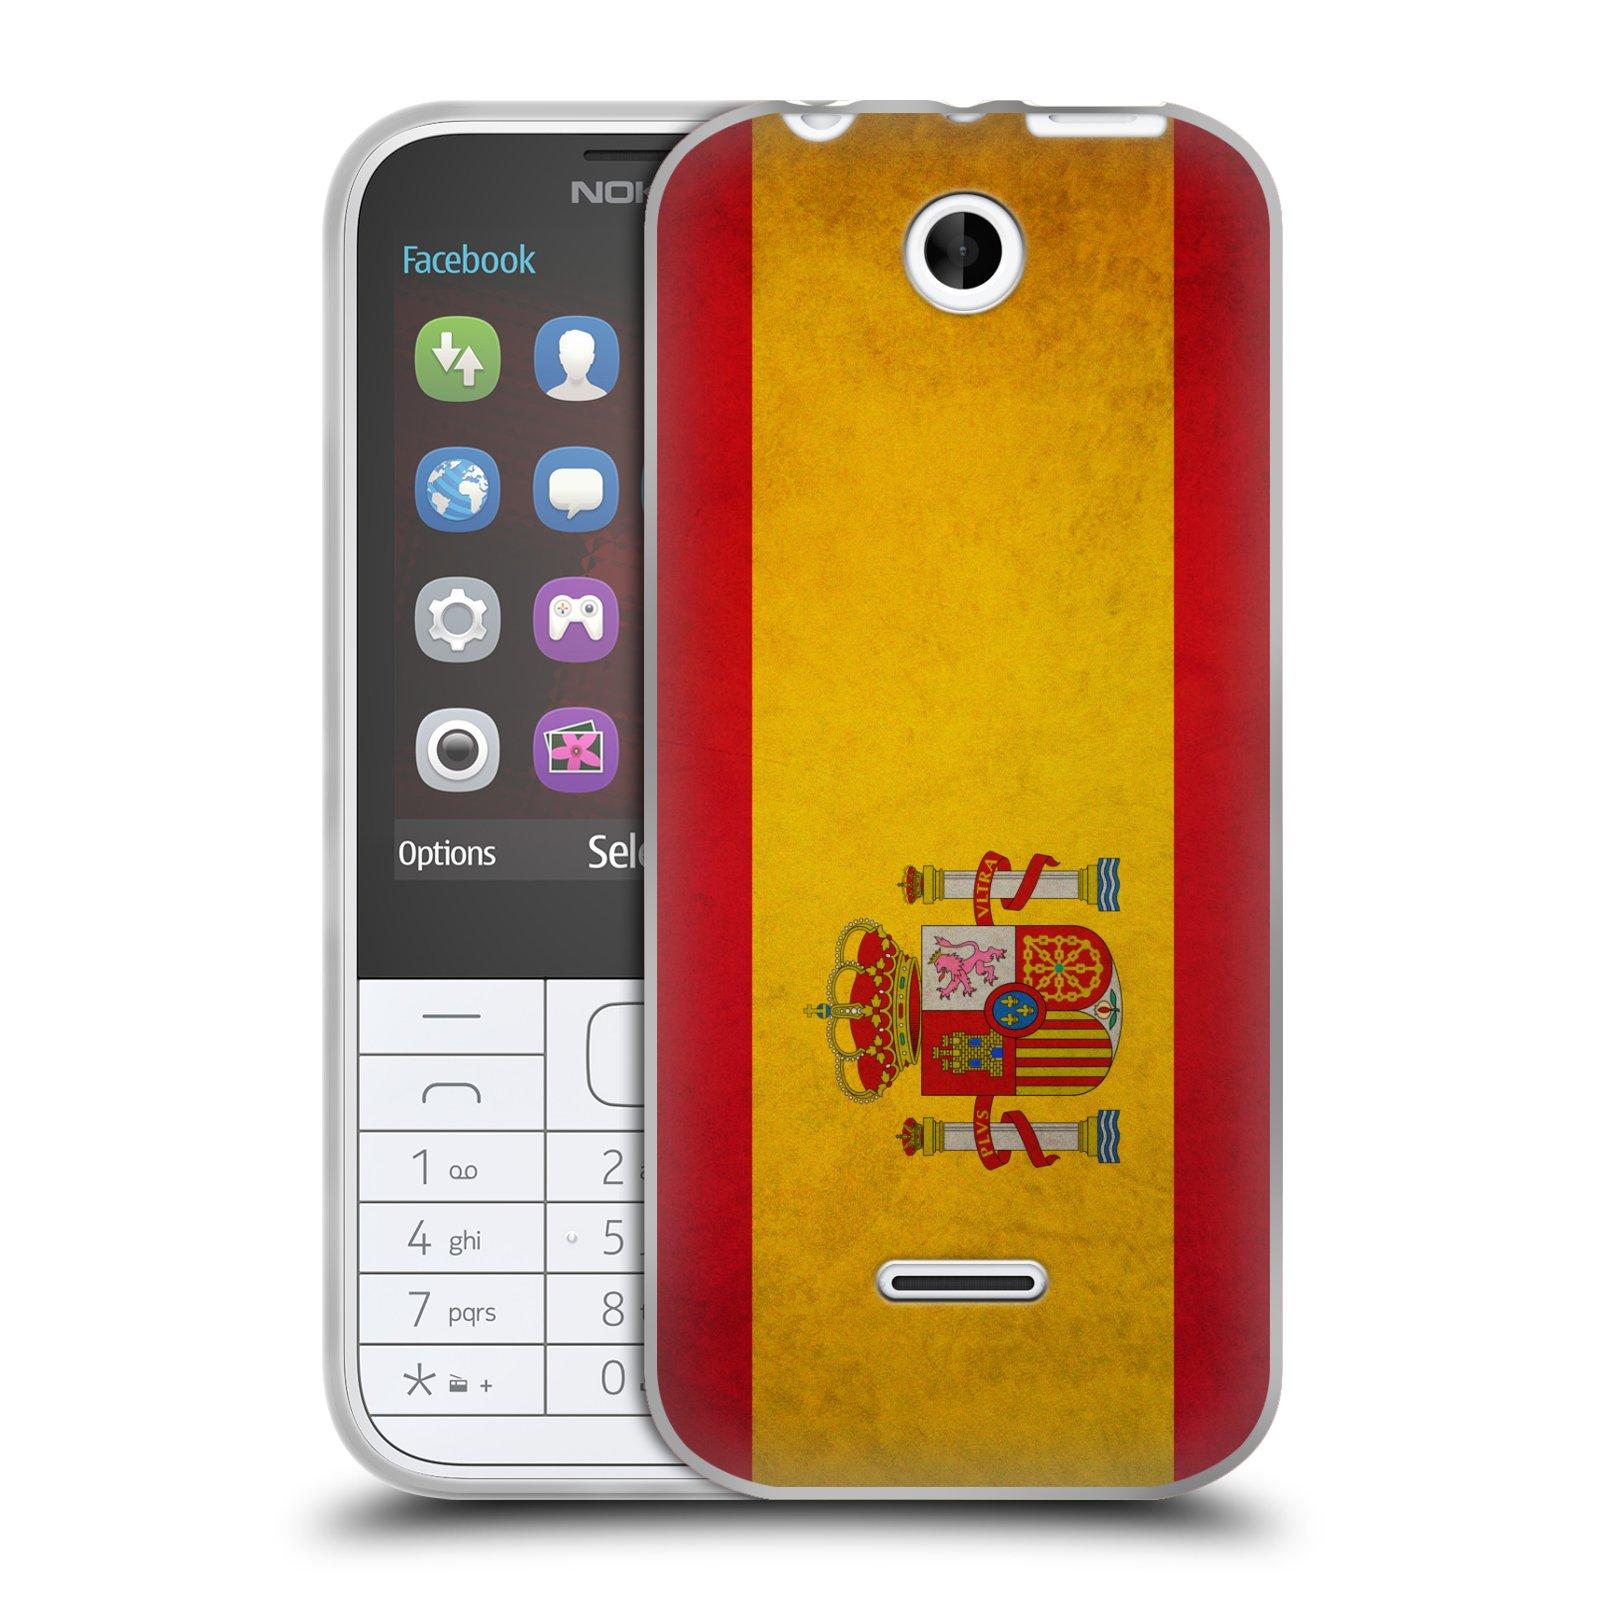 Silikonové pouzdro na mobil Nokia 225 HEAD CASE VLAJKA ŠPANĚLSKO (Silikonový kryt či obal na mobilní telefon Nokia 225)